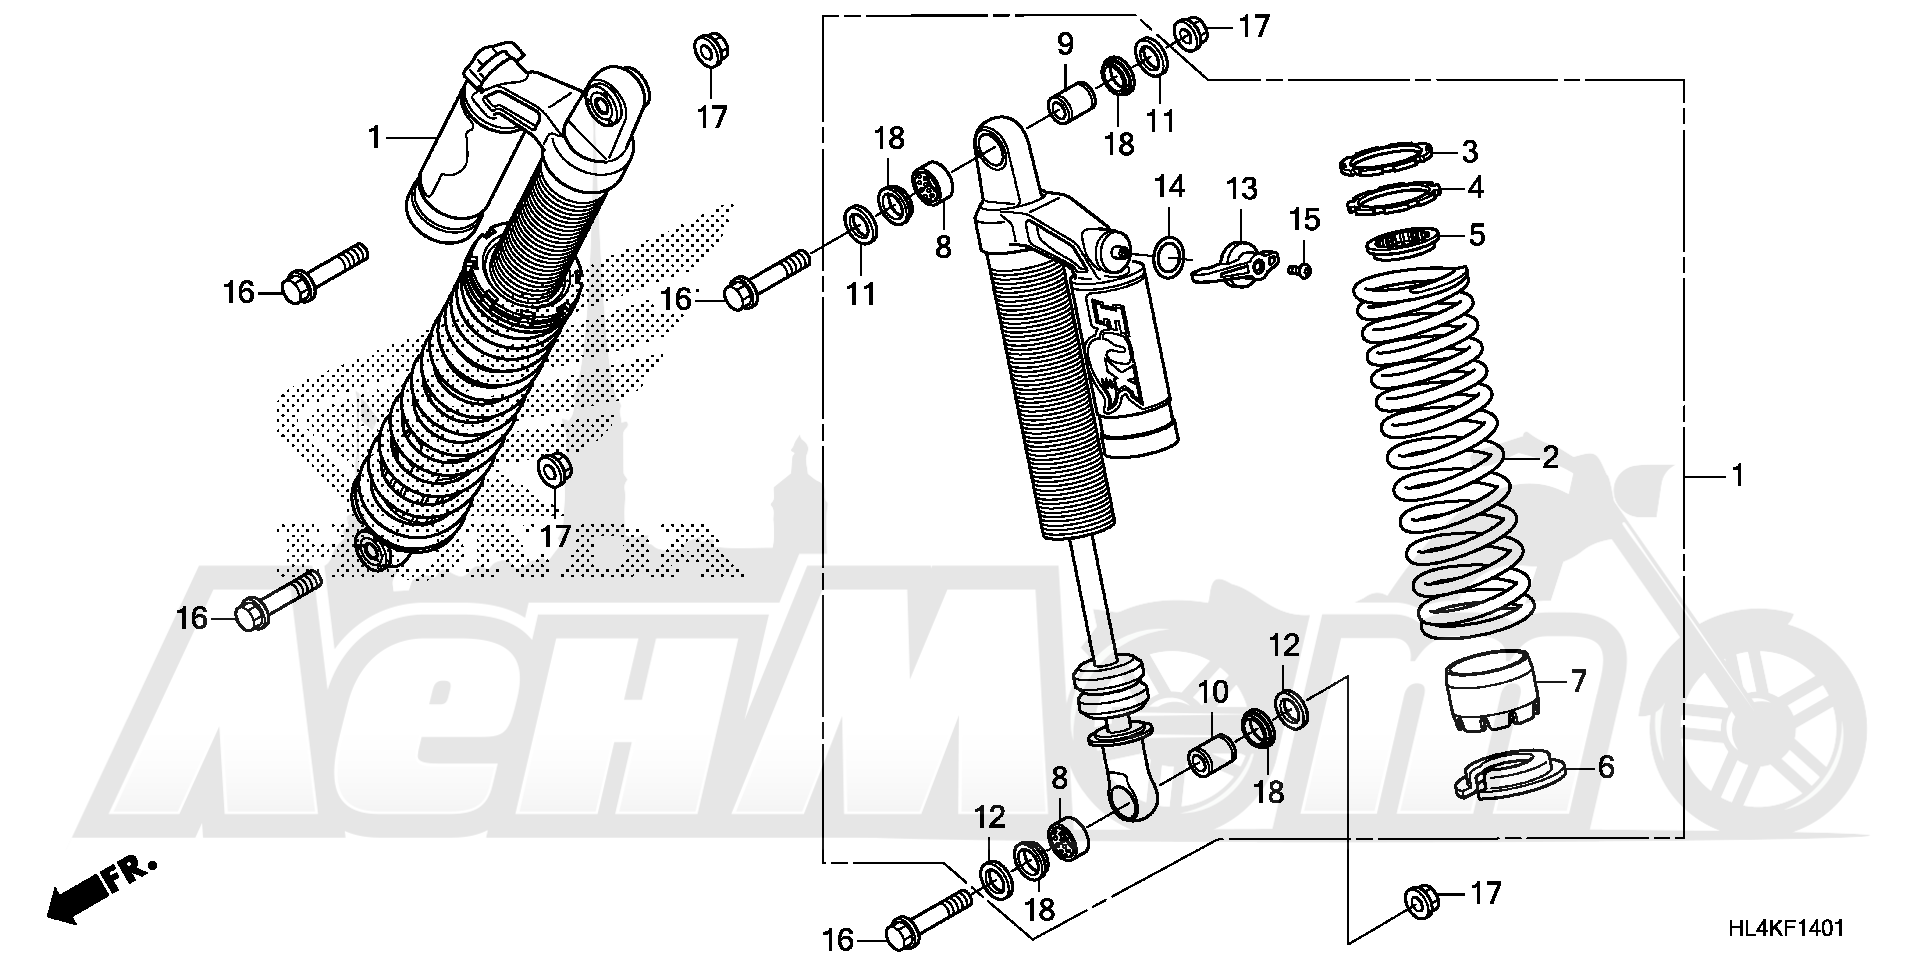 Запчасти для Квадроцикла Honda 2019 SXS1000M5D Раздел: FRONT CUSHION (2)   перед подкладка (2)